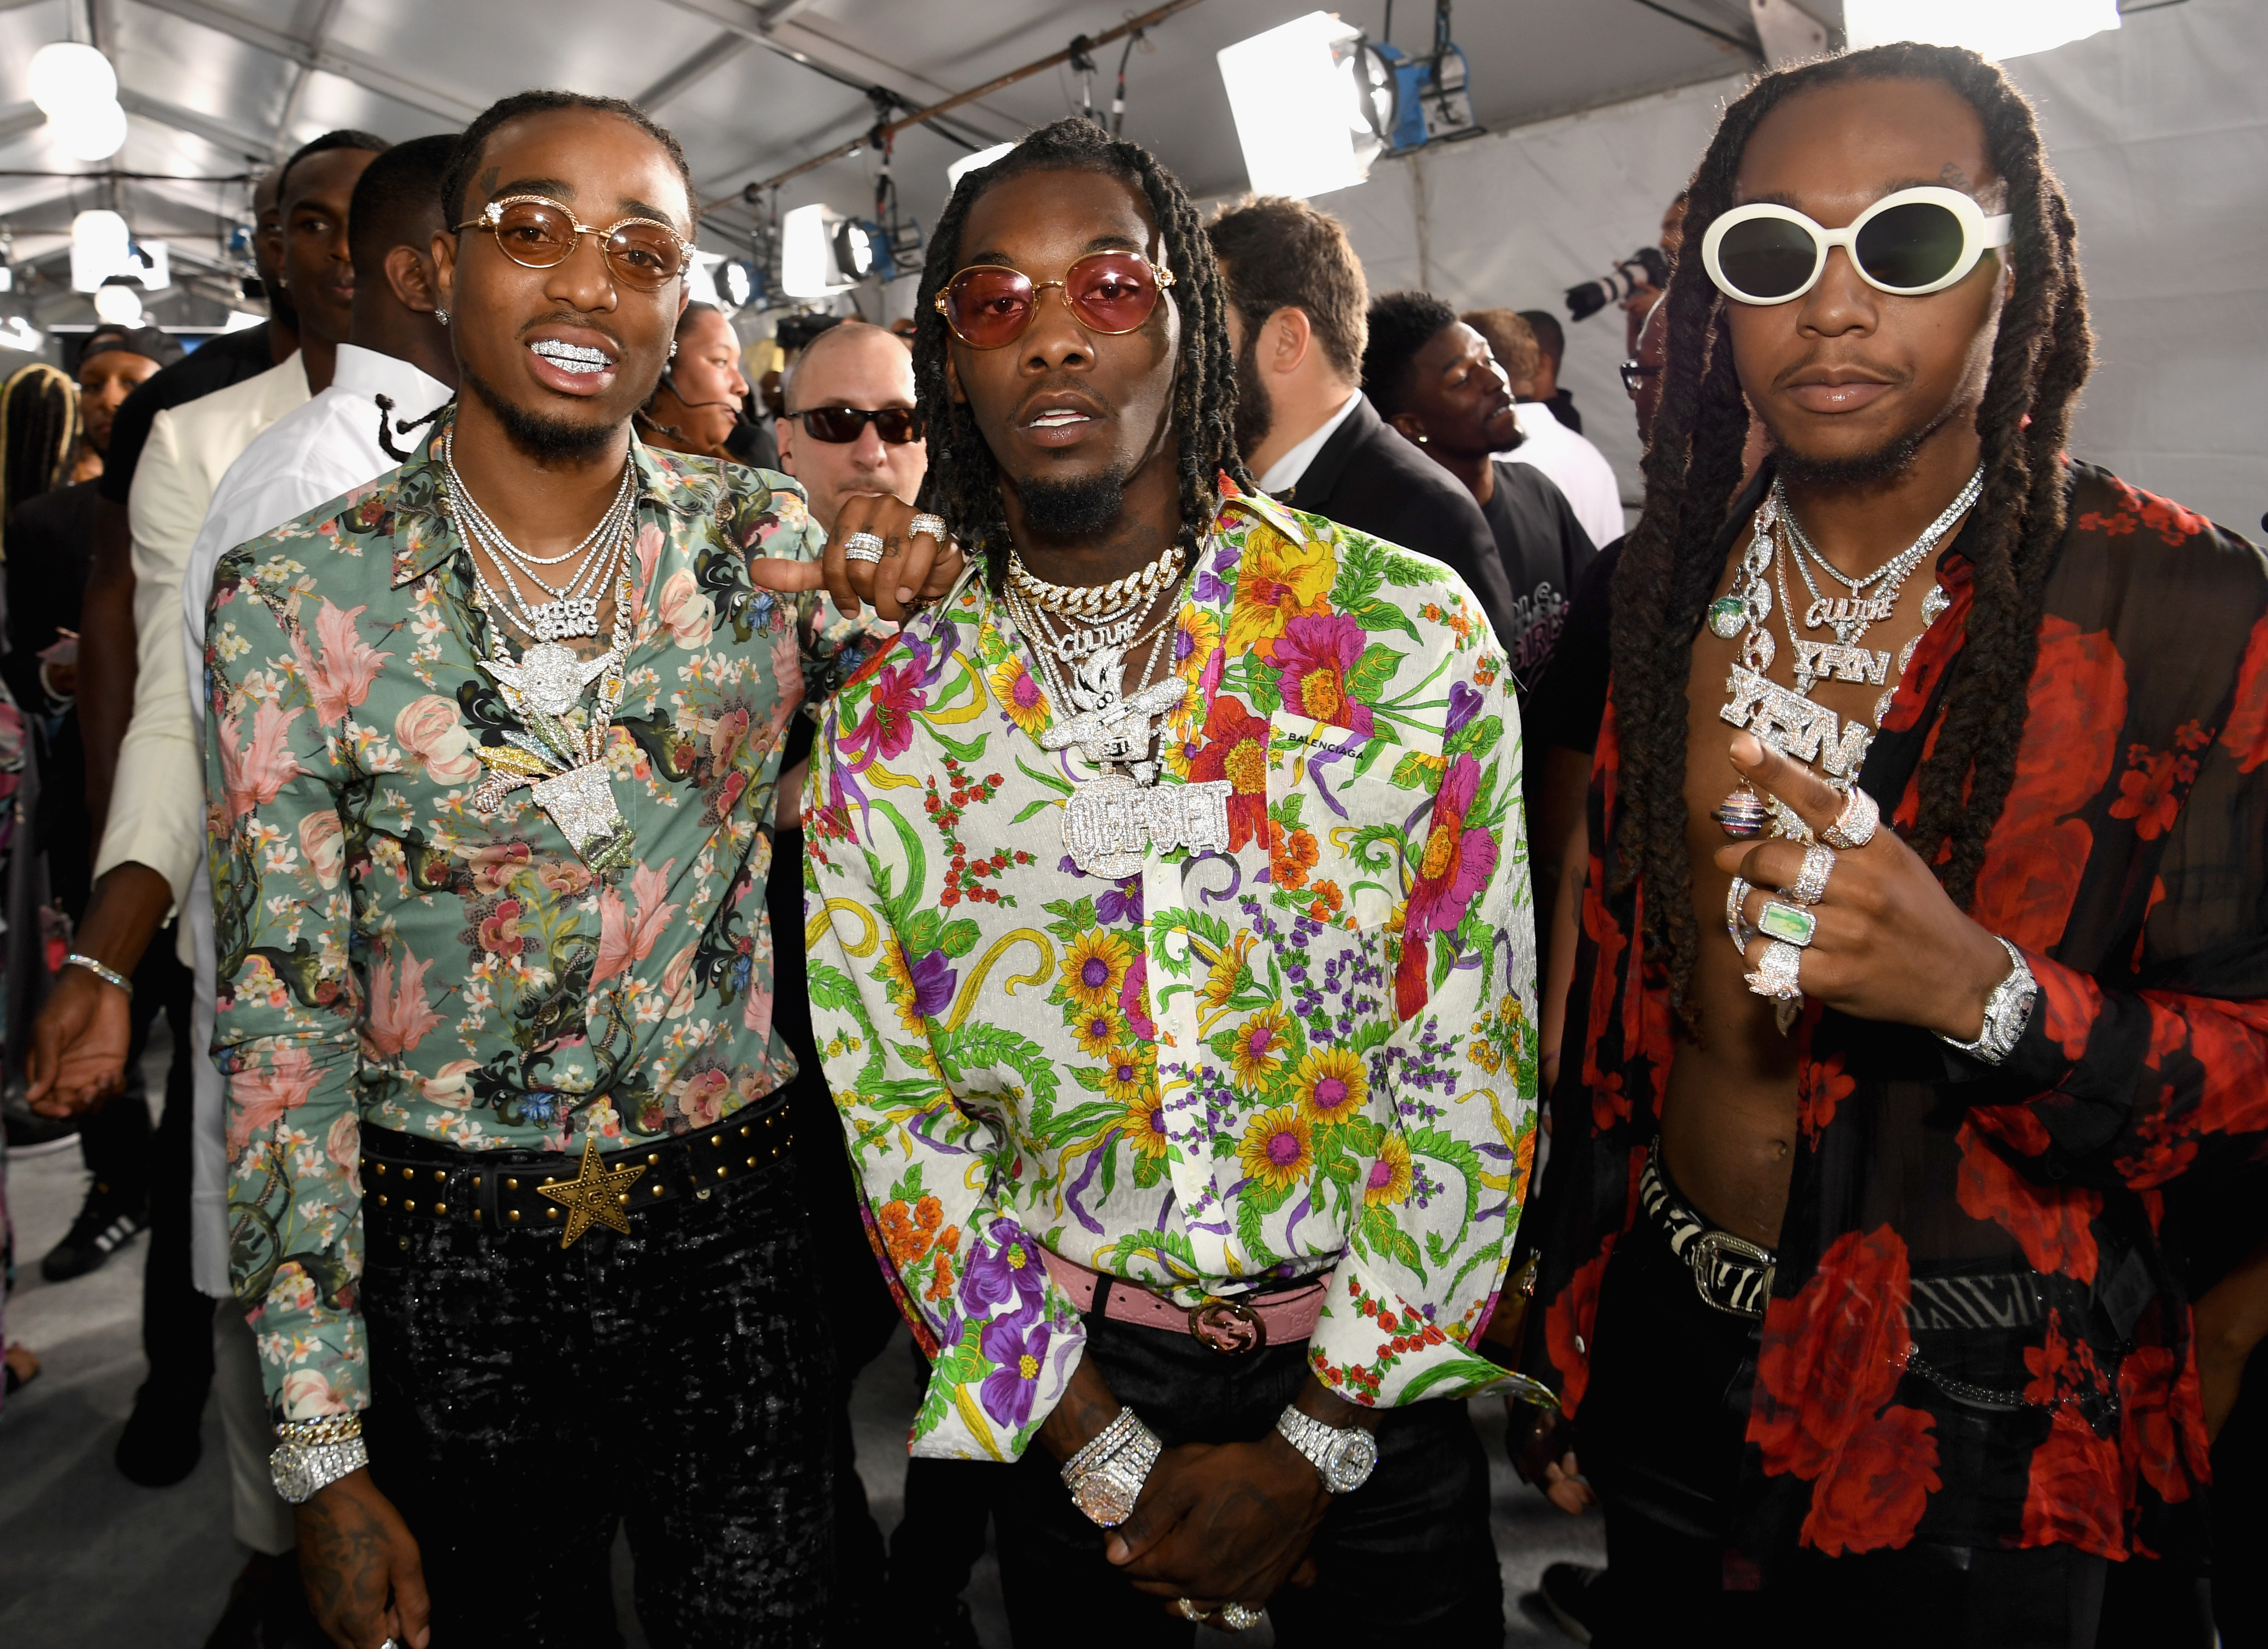 Atlanta rap group 'Migos' removed from Delta flight ...